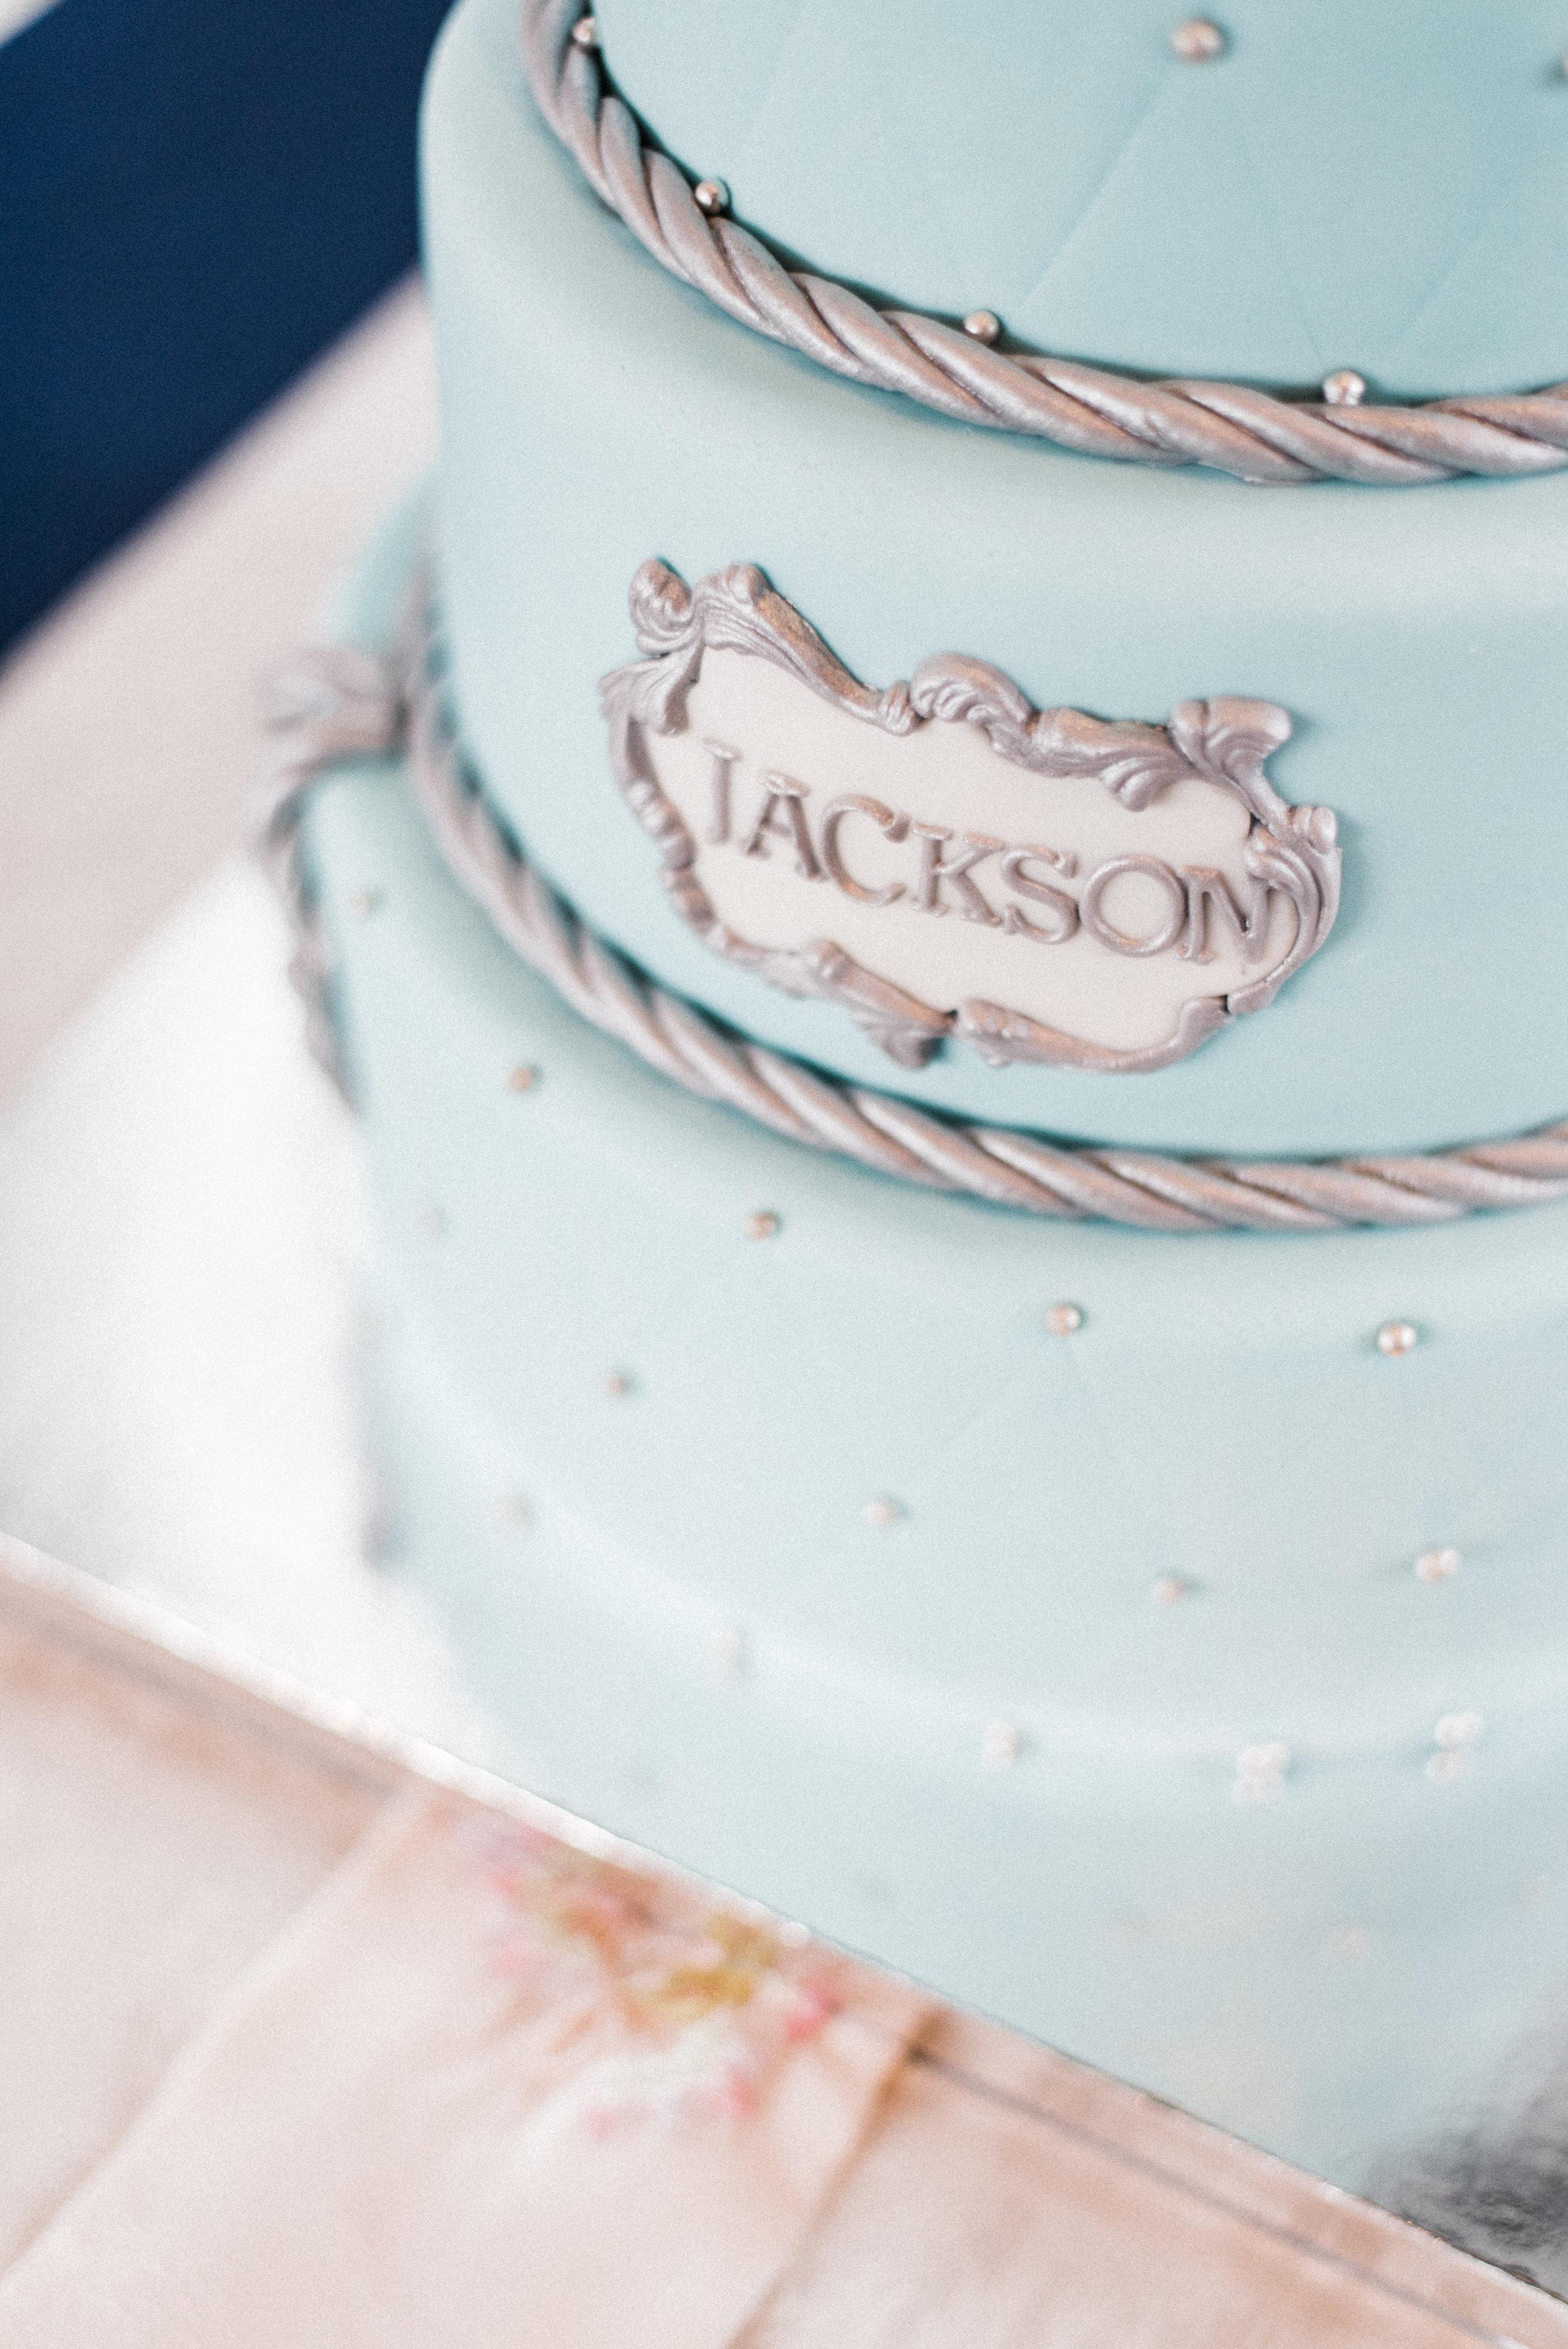 Jackon_1st_Birthday-7.jpg